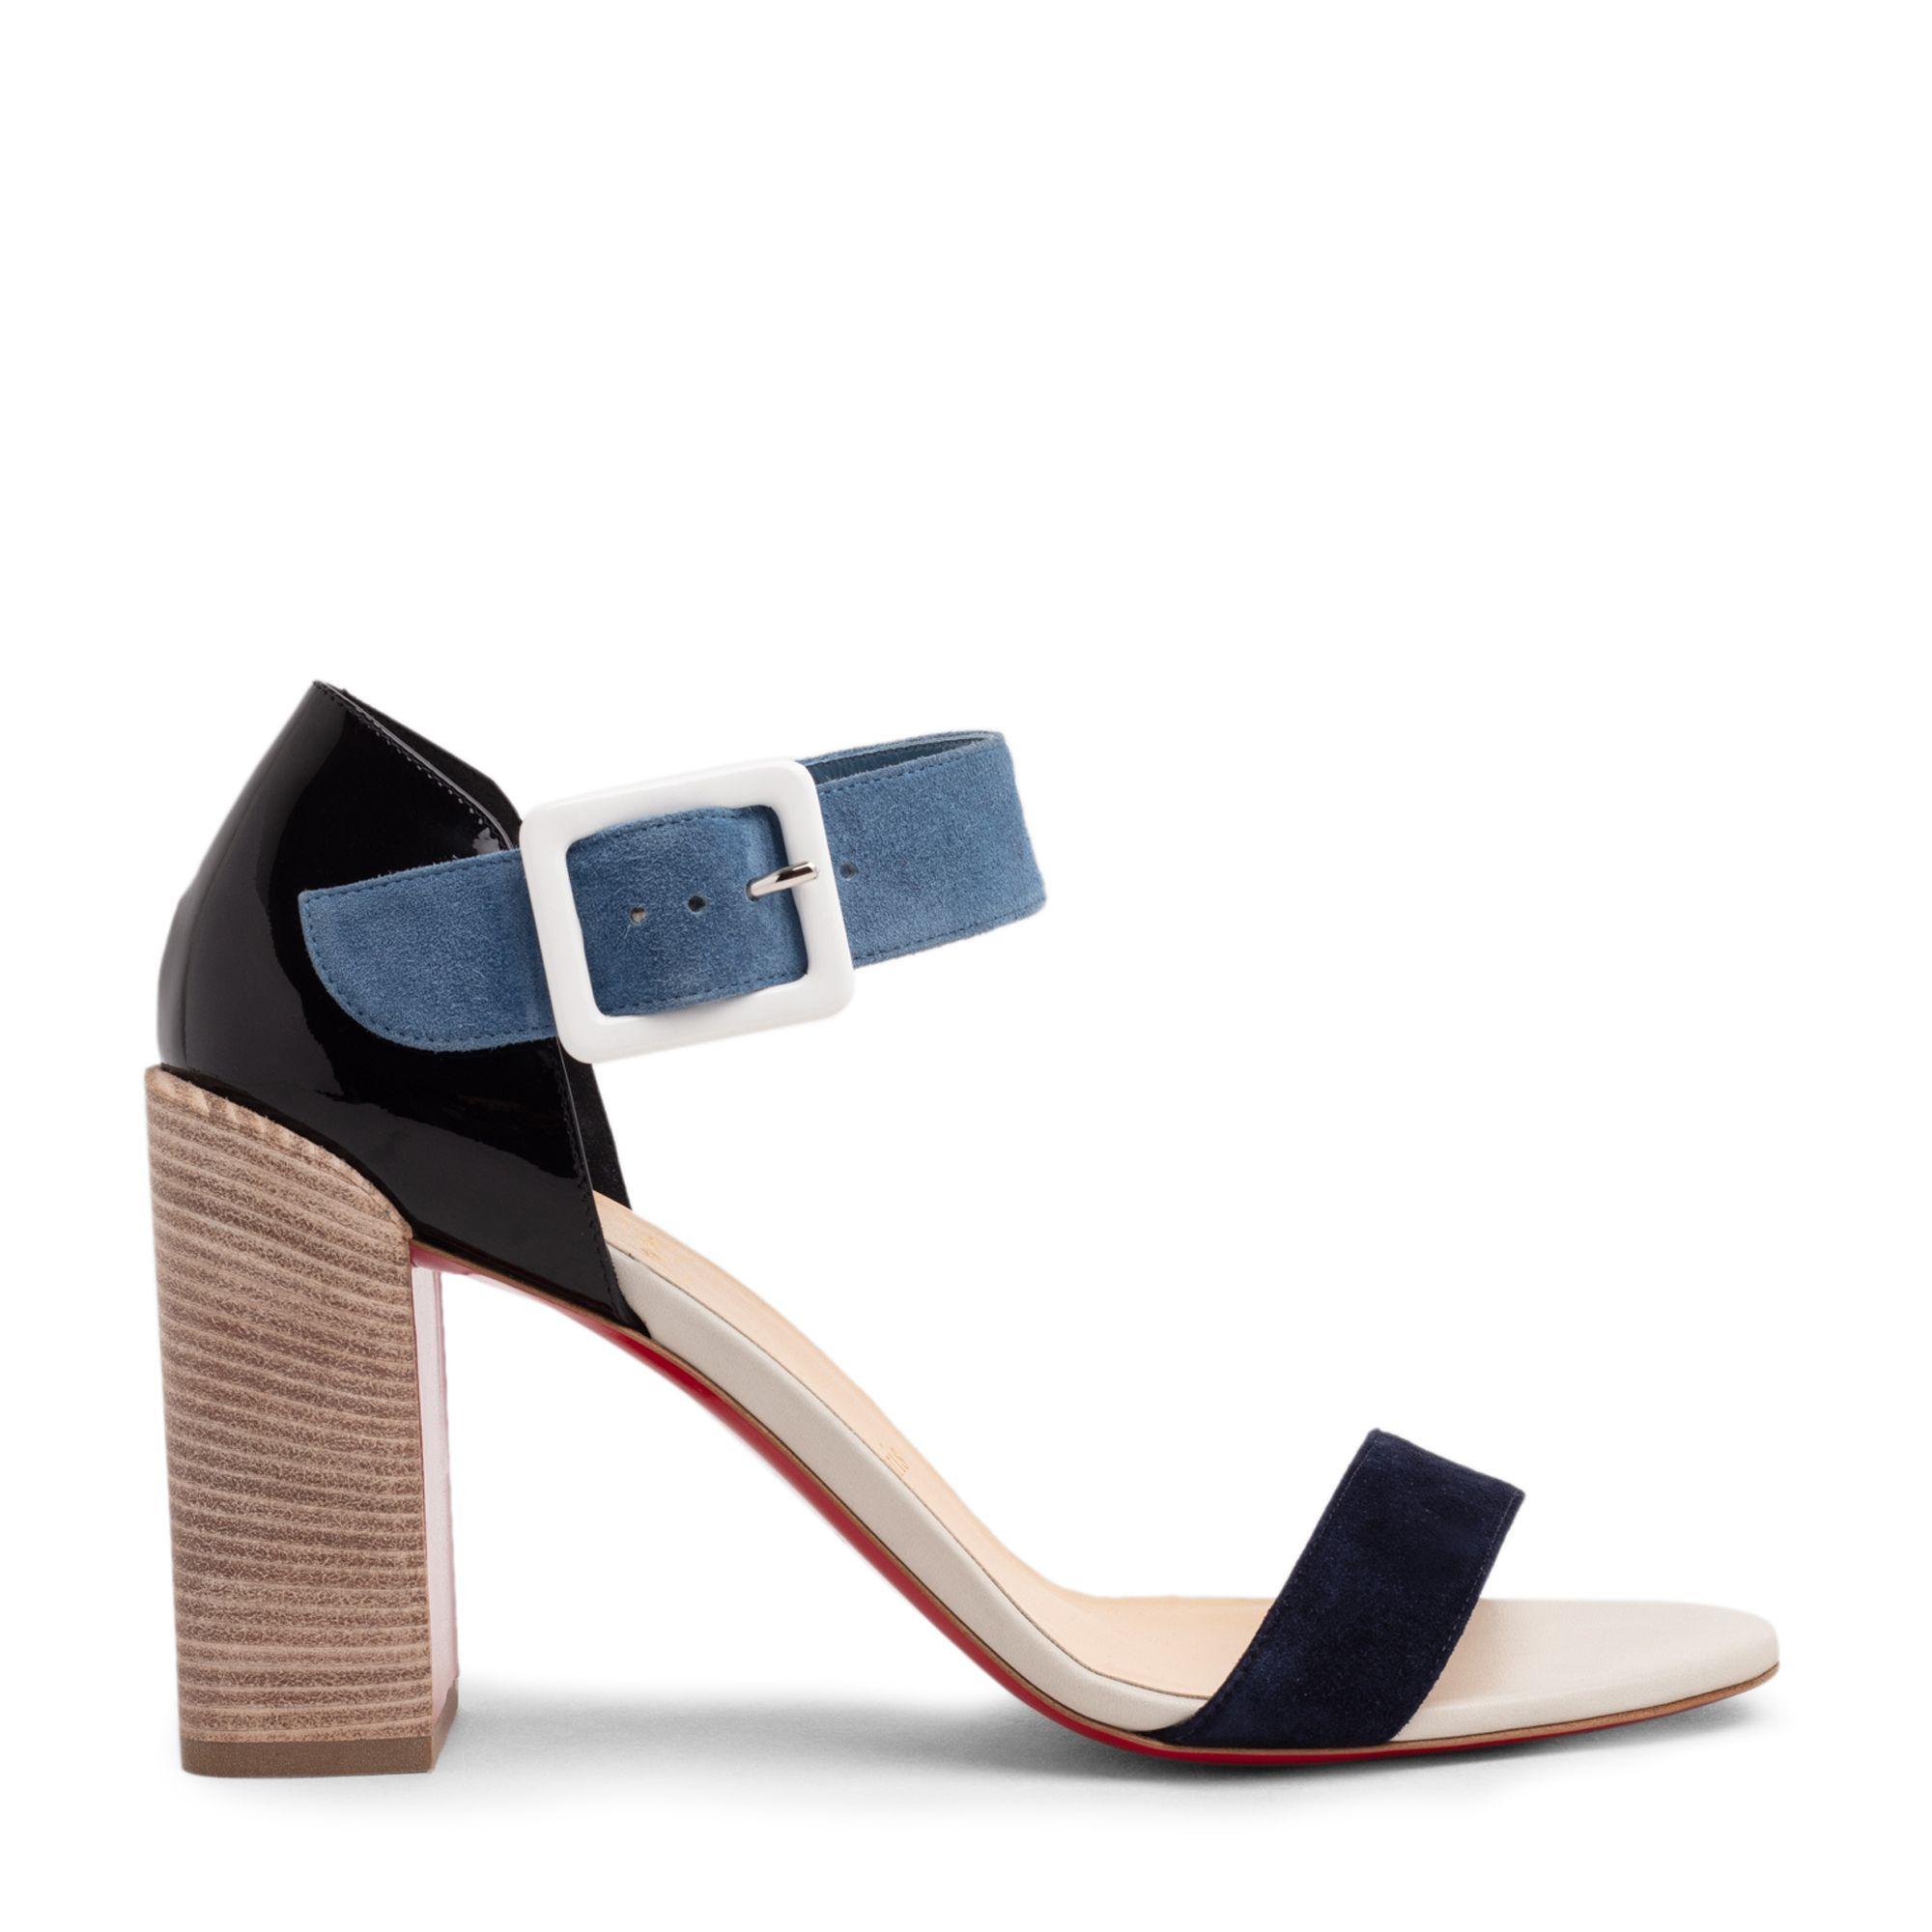 Ariadne 85 sandals